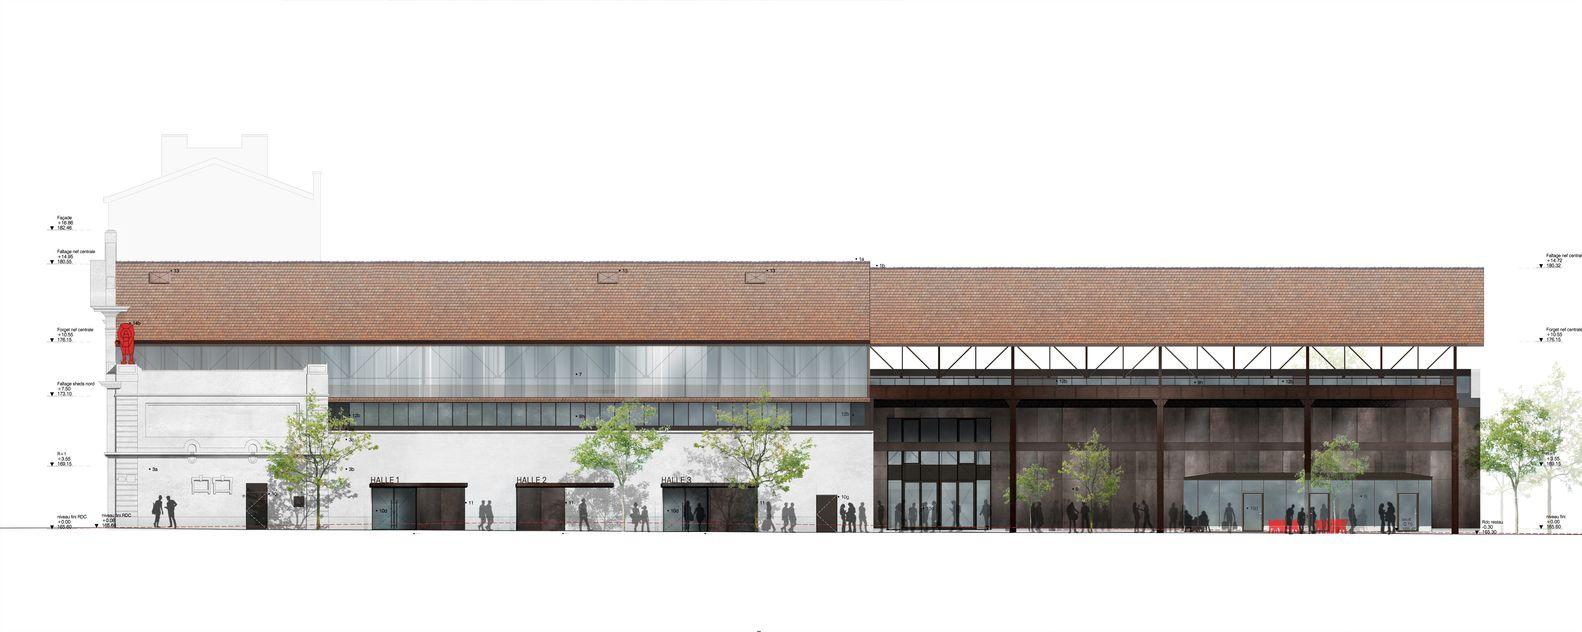 Gallery of Halle Girard Building Renovation / Vurpas